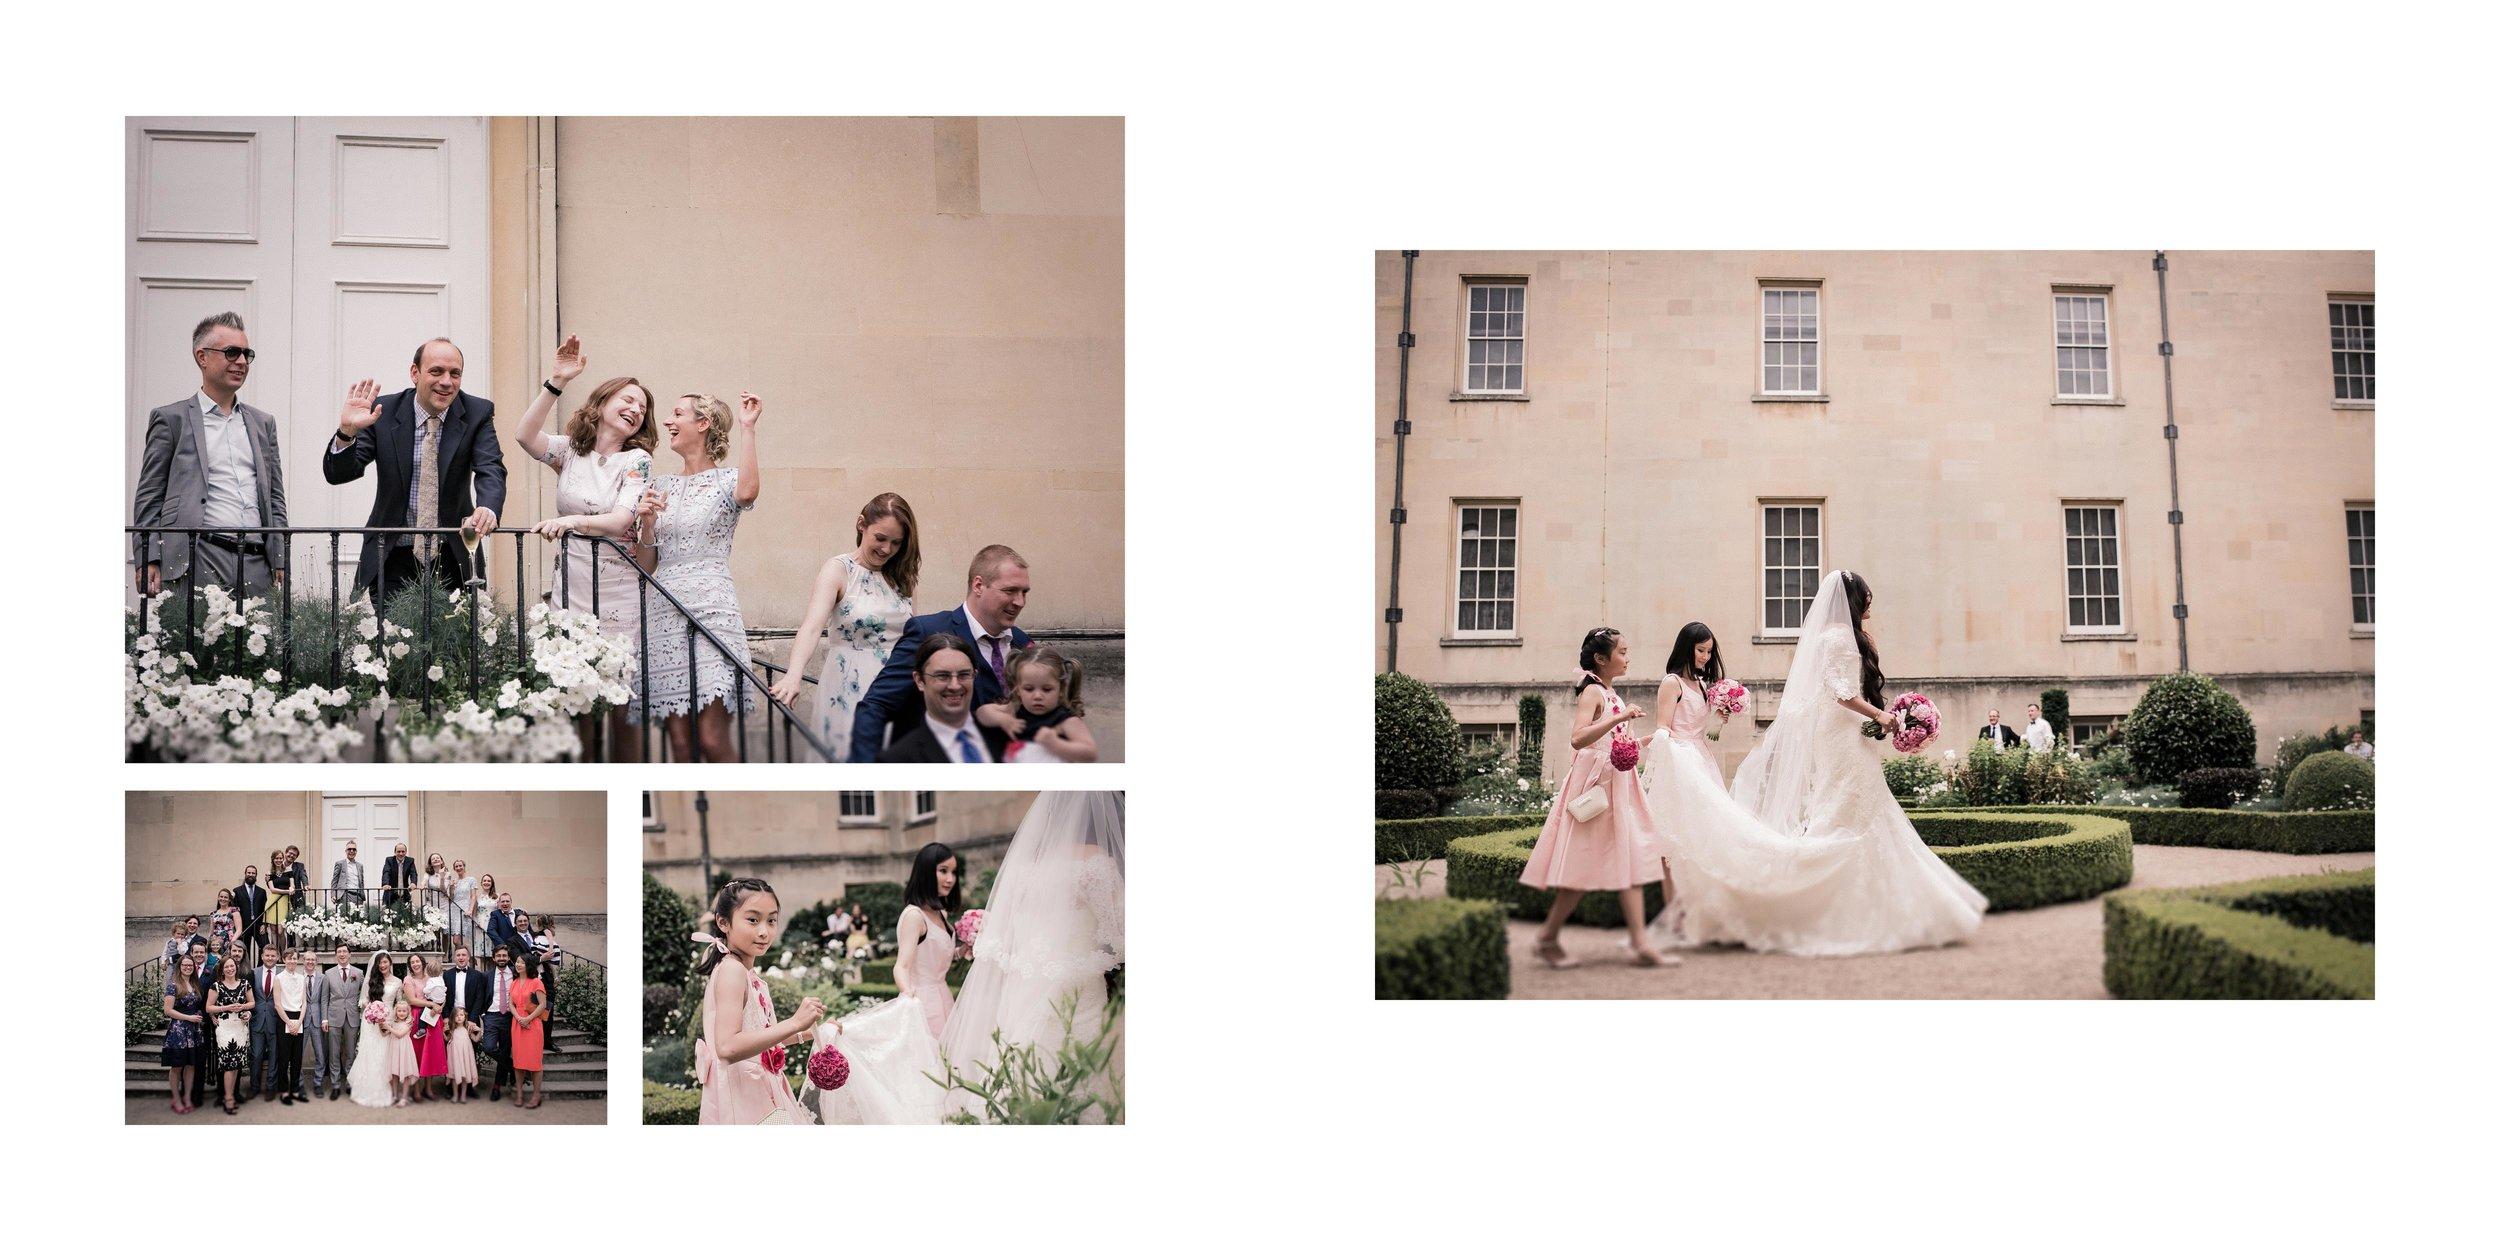 wedding_photographer_surrey_41.jpg